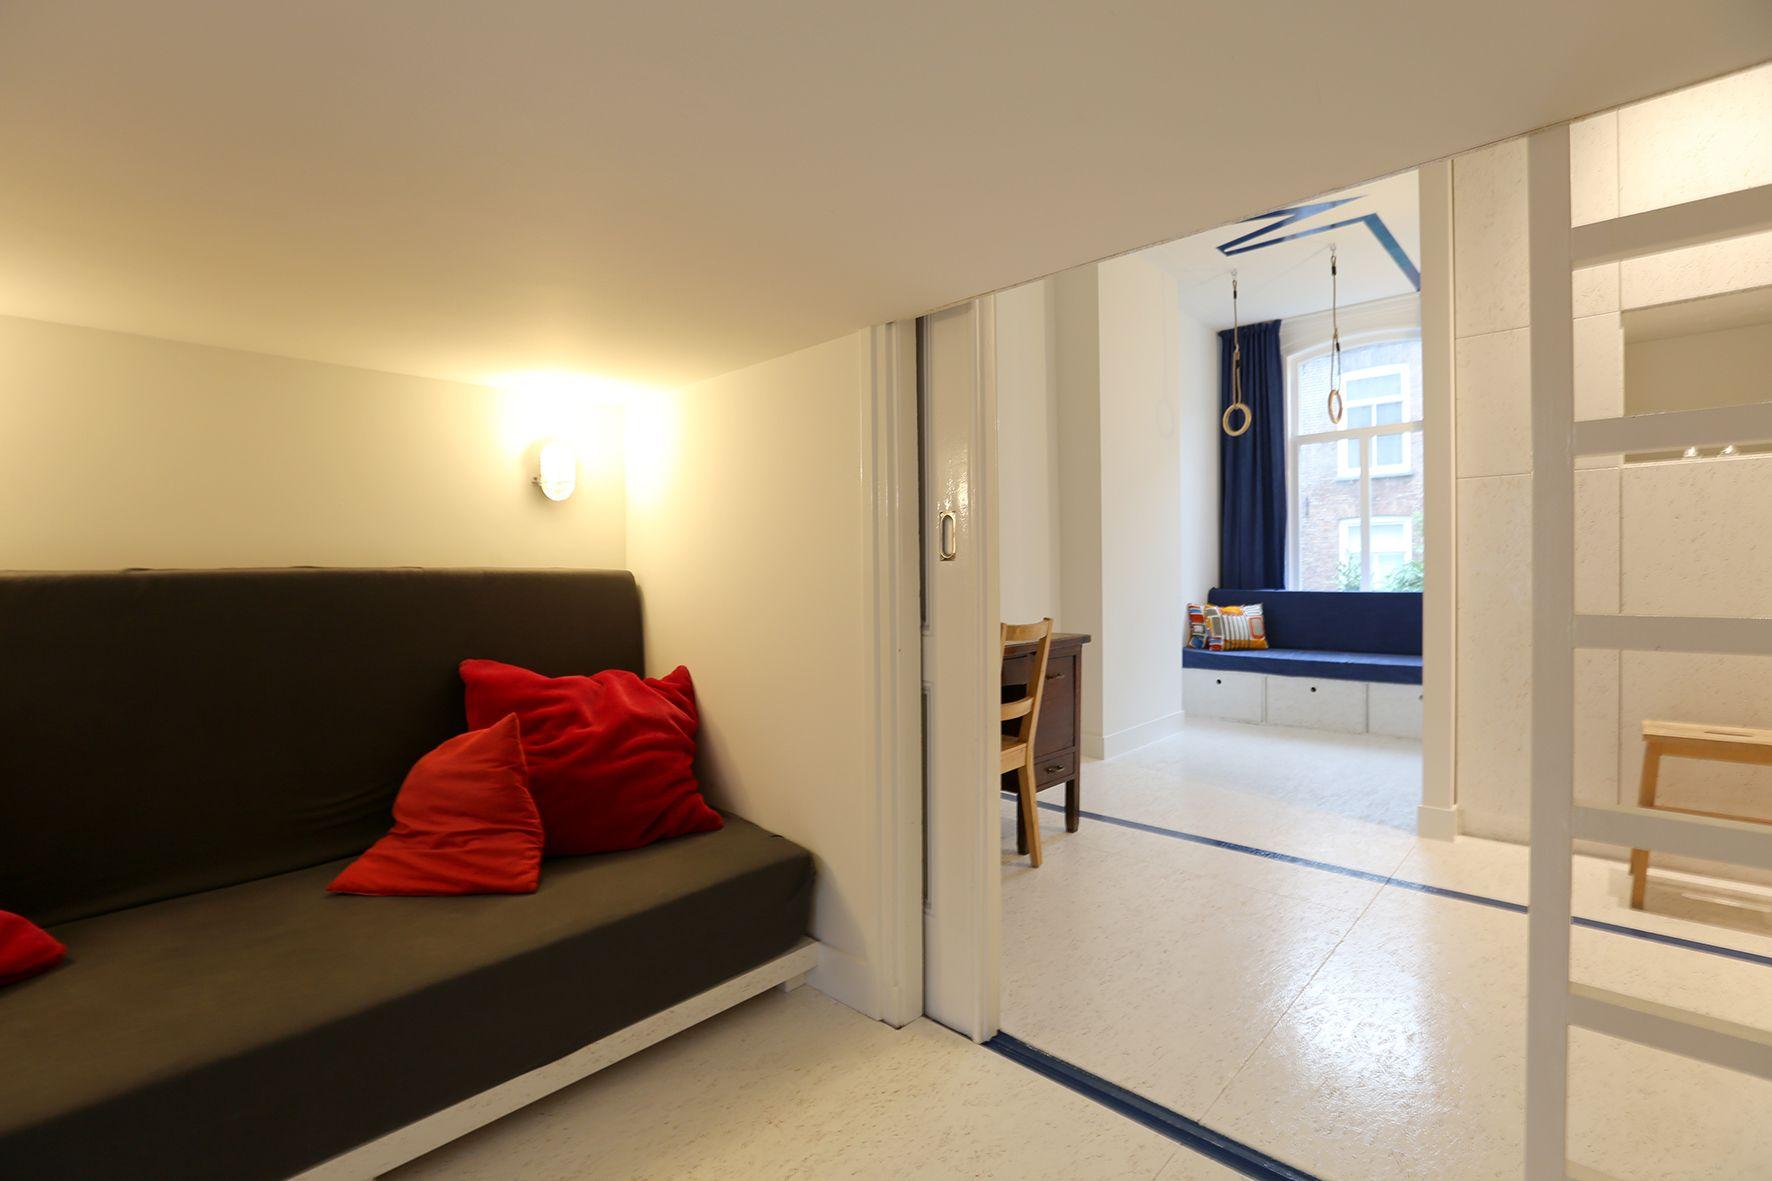 Studio ei woning 19 interieurproject hemonylaan for Interieurontwerp amsterdam